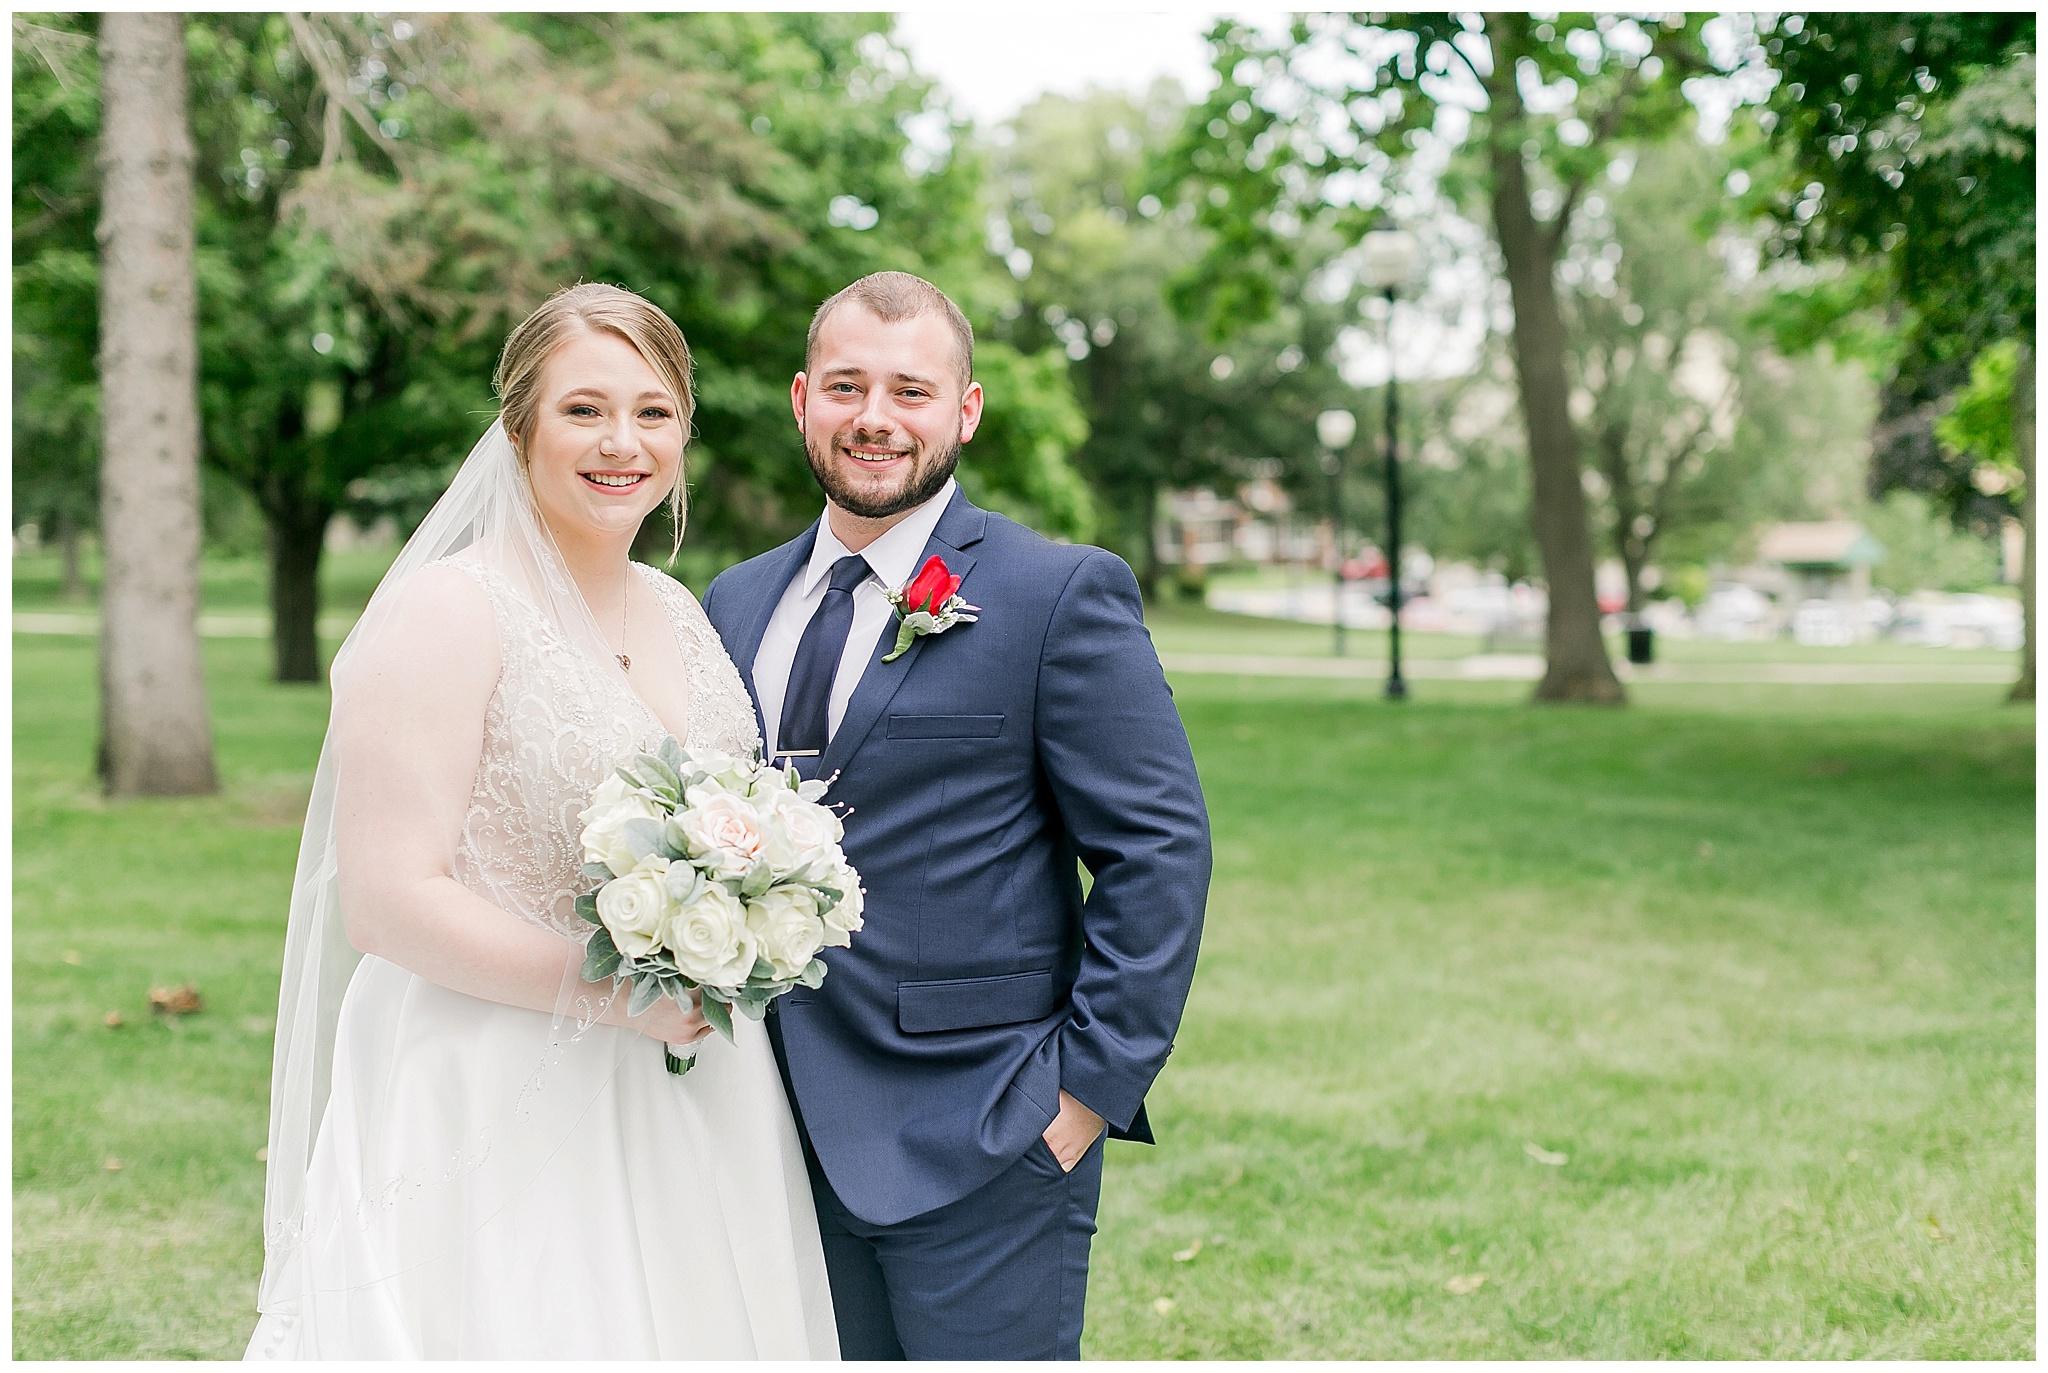 la_casa_grande_wedding_beloit_wisconsin_caynay_photo_0022.jpg